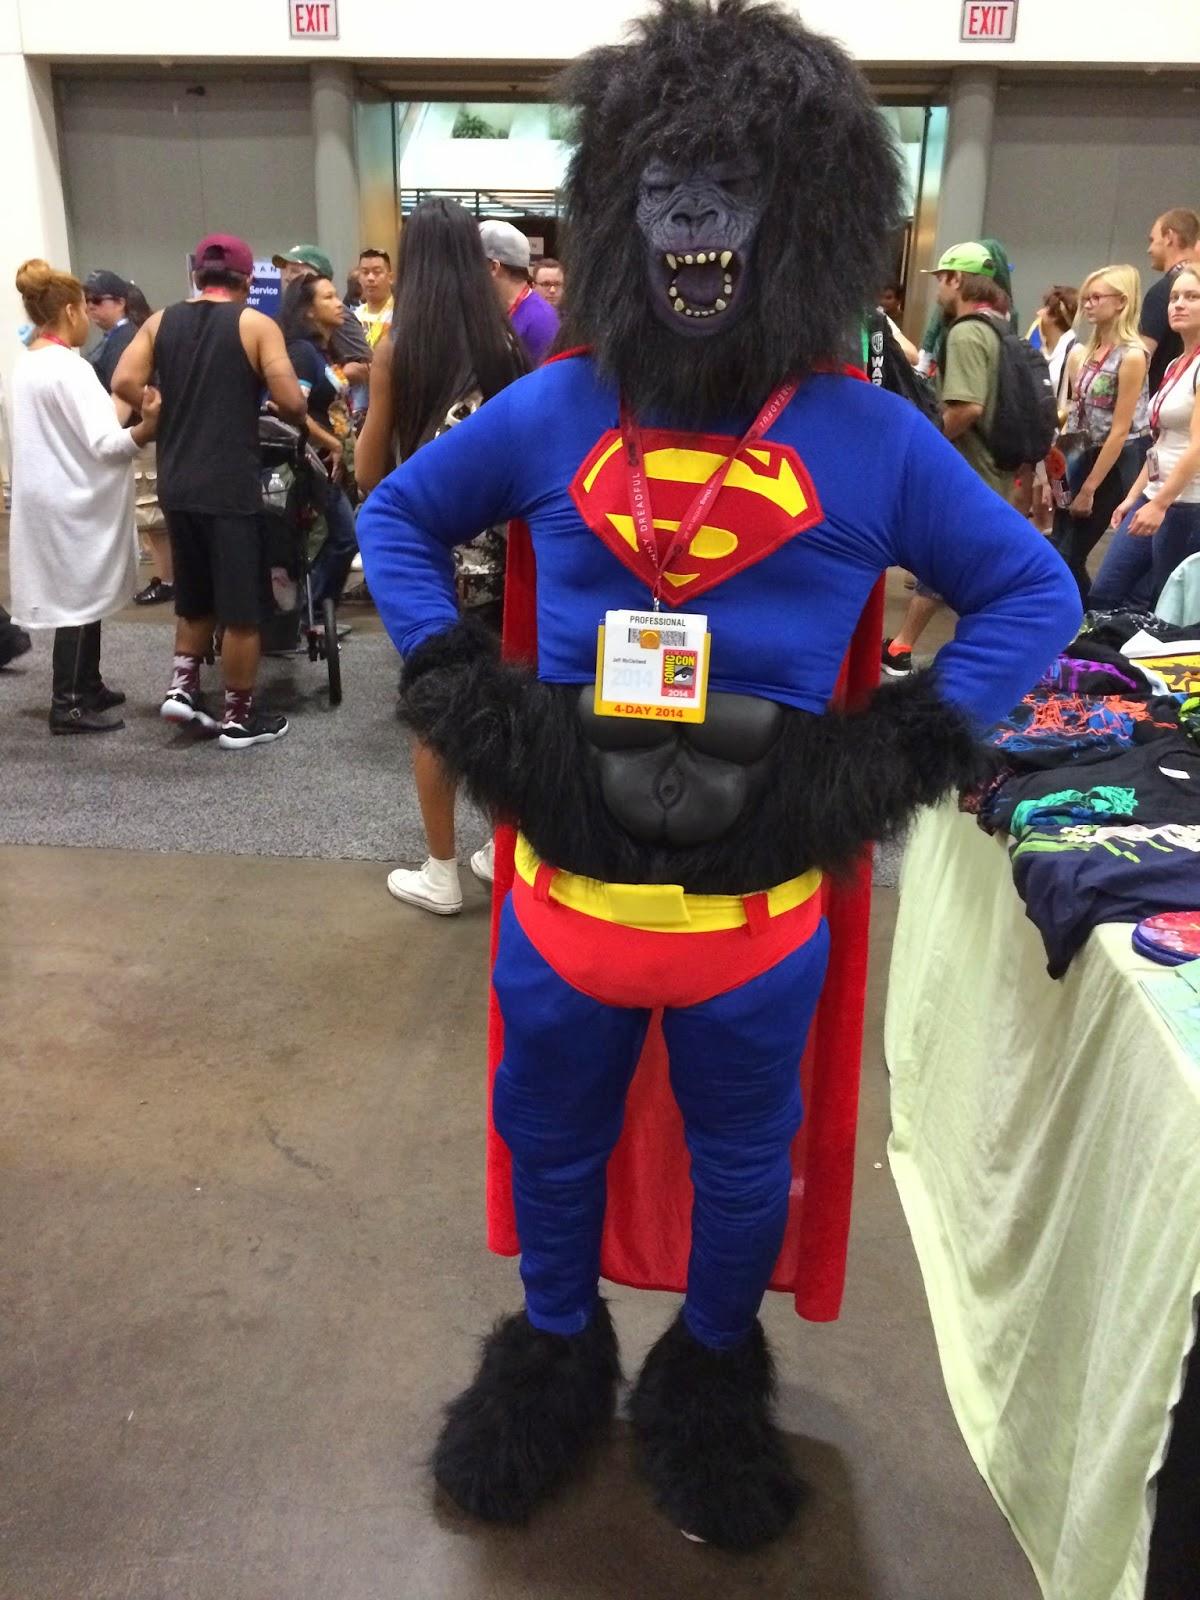 the yeti speaks!: gorilla superman at comic-con international 2014